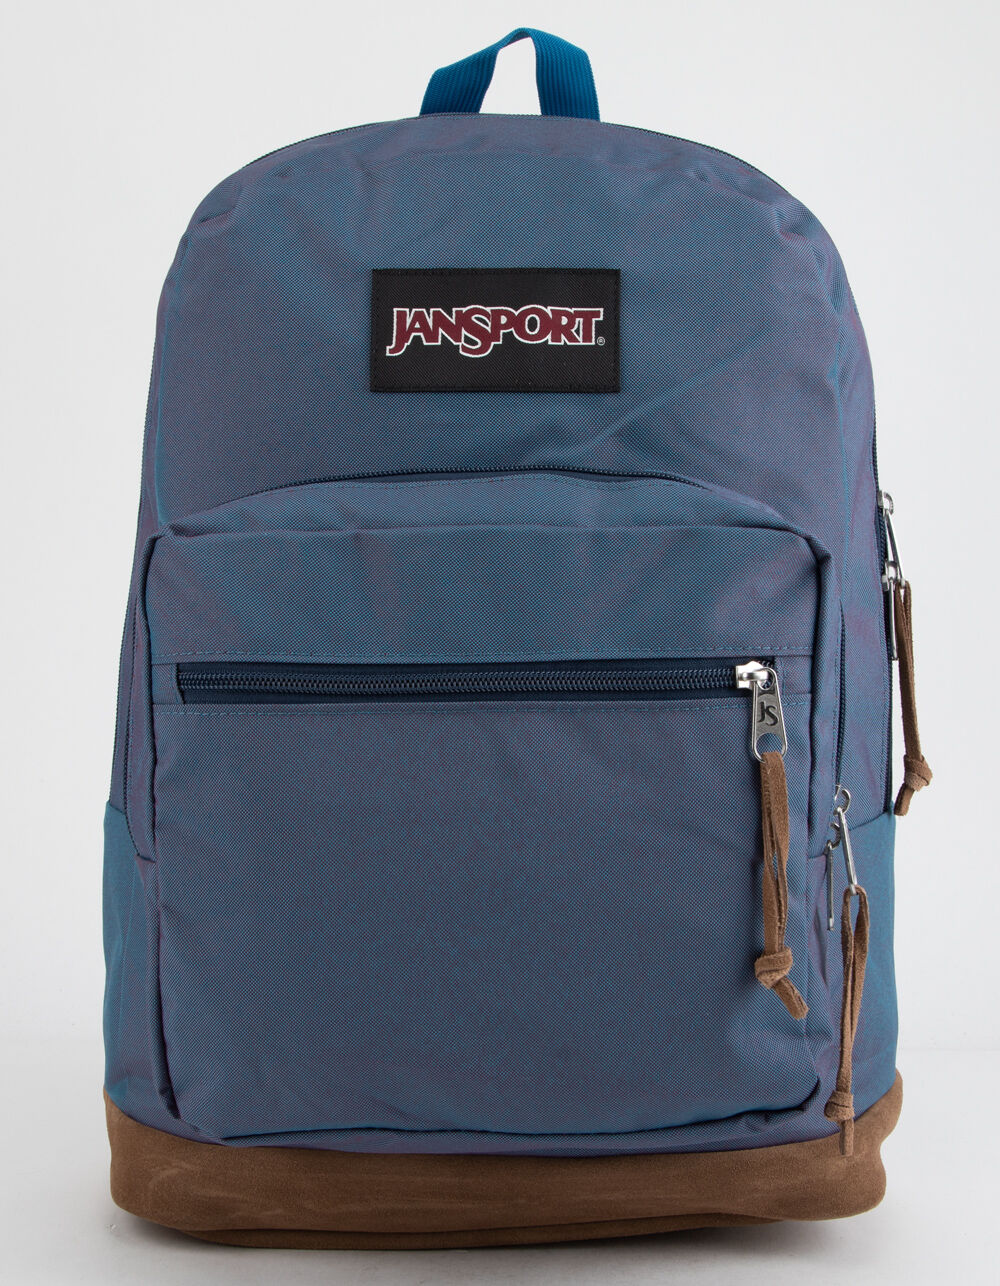 JANSPORT Right Pack Digital Edition Blue Jay Laptop Backpack